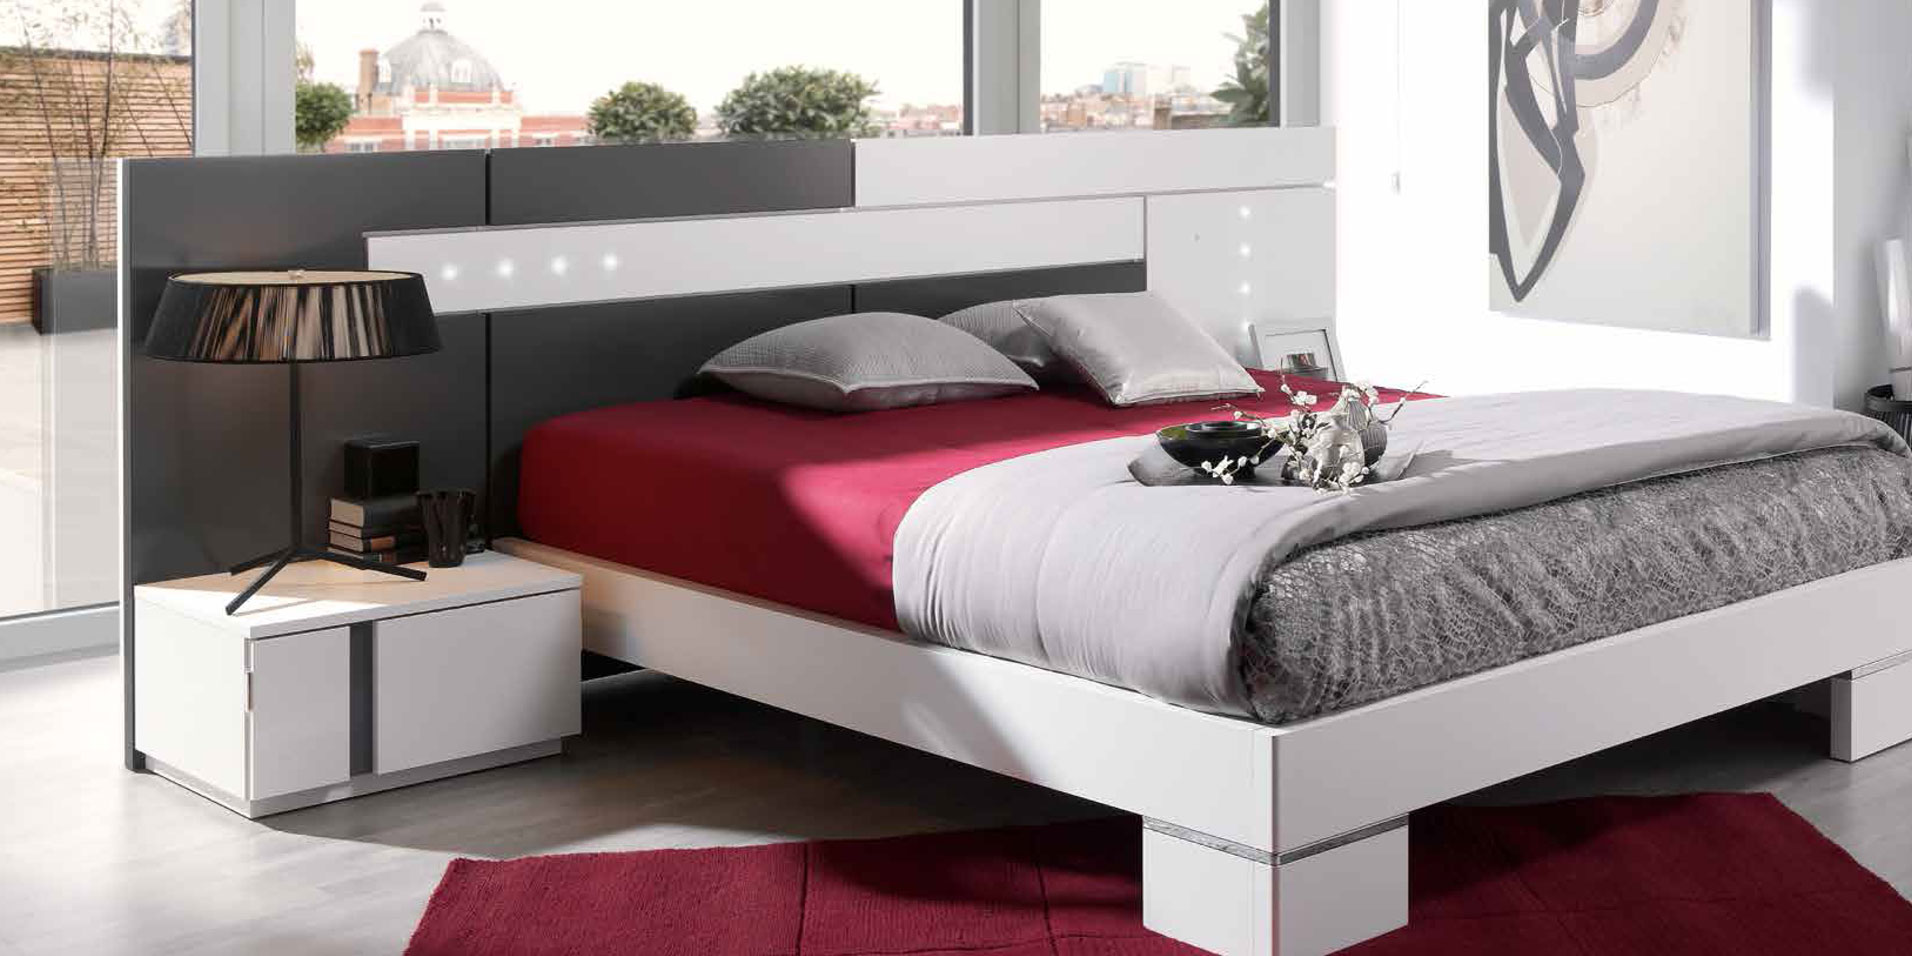 Muebles Ponferrada - Ofertas Muebles Ponferrada Flash Dise O Interiorismo[mjhdah]http://ameuble.com/imagenes/00655-1442.JPG